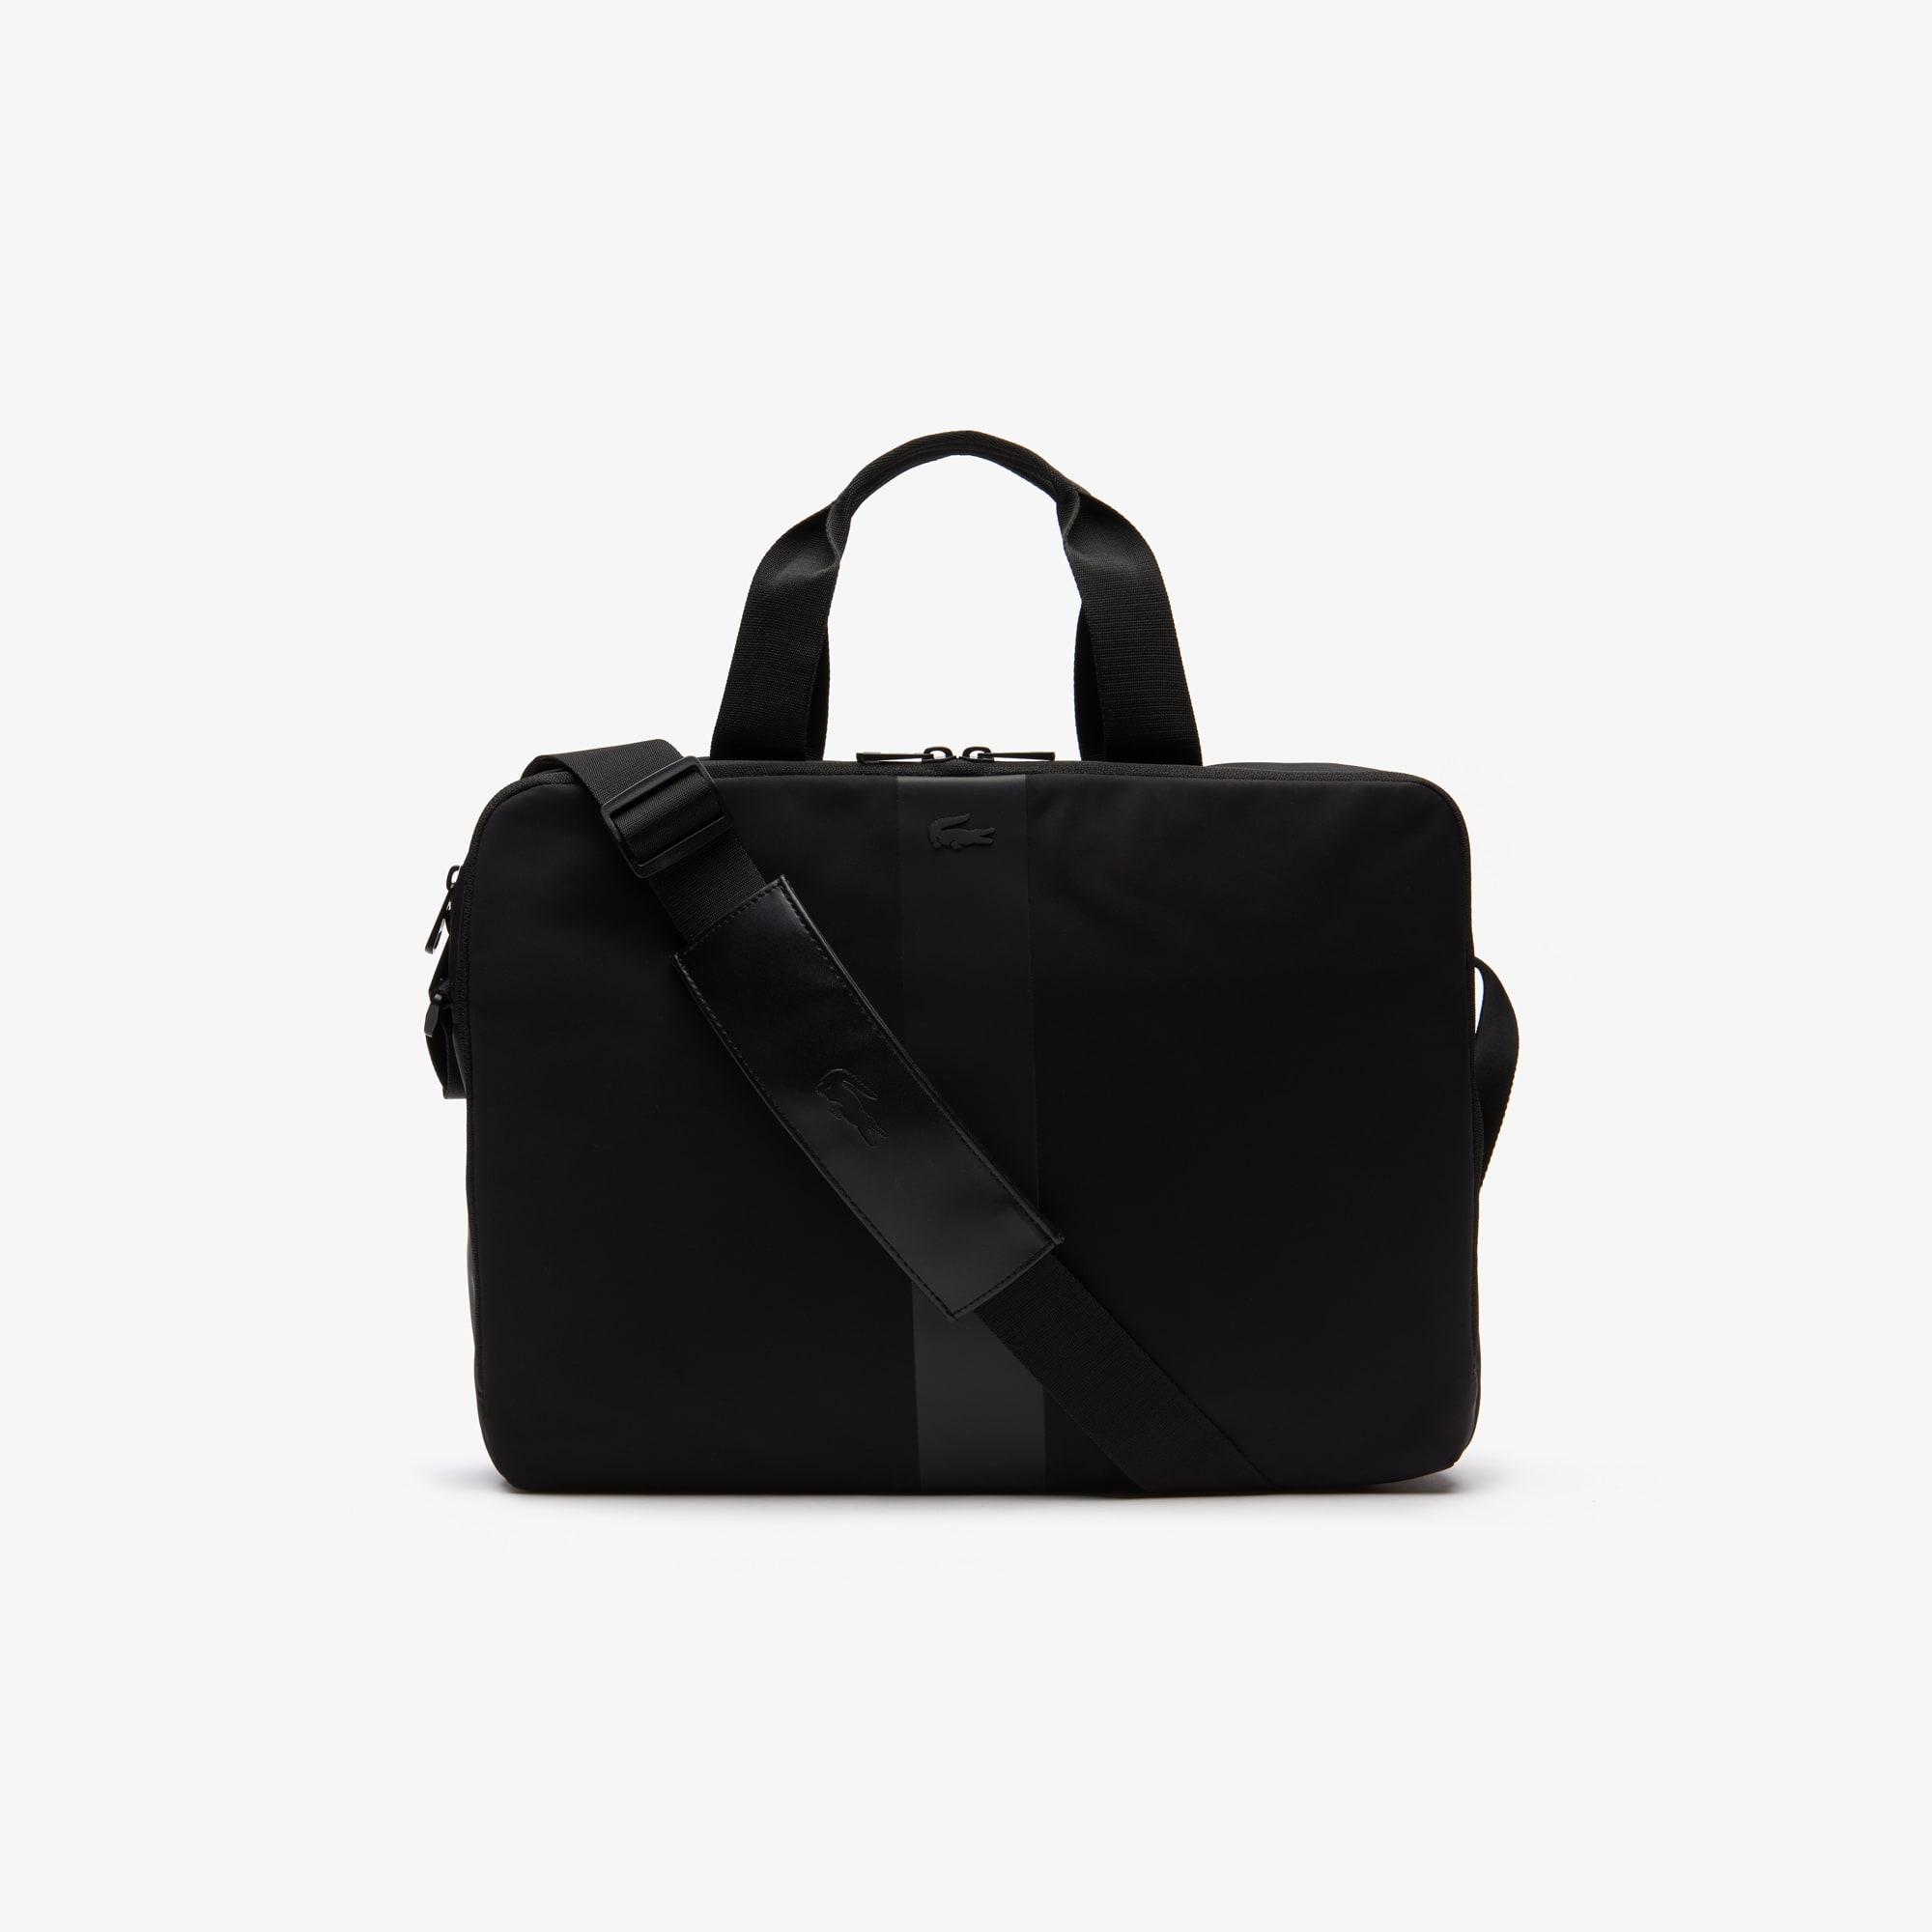 Men's Urban Trek Contrast Accents Nylon Computer Bag